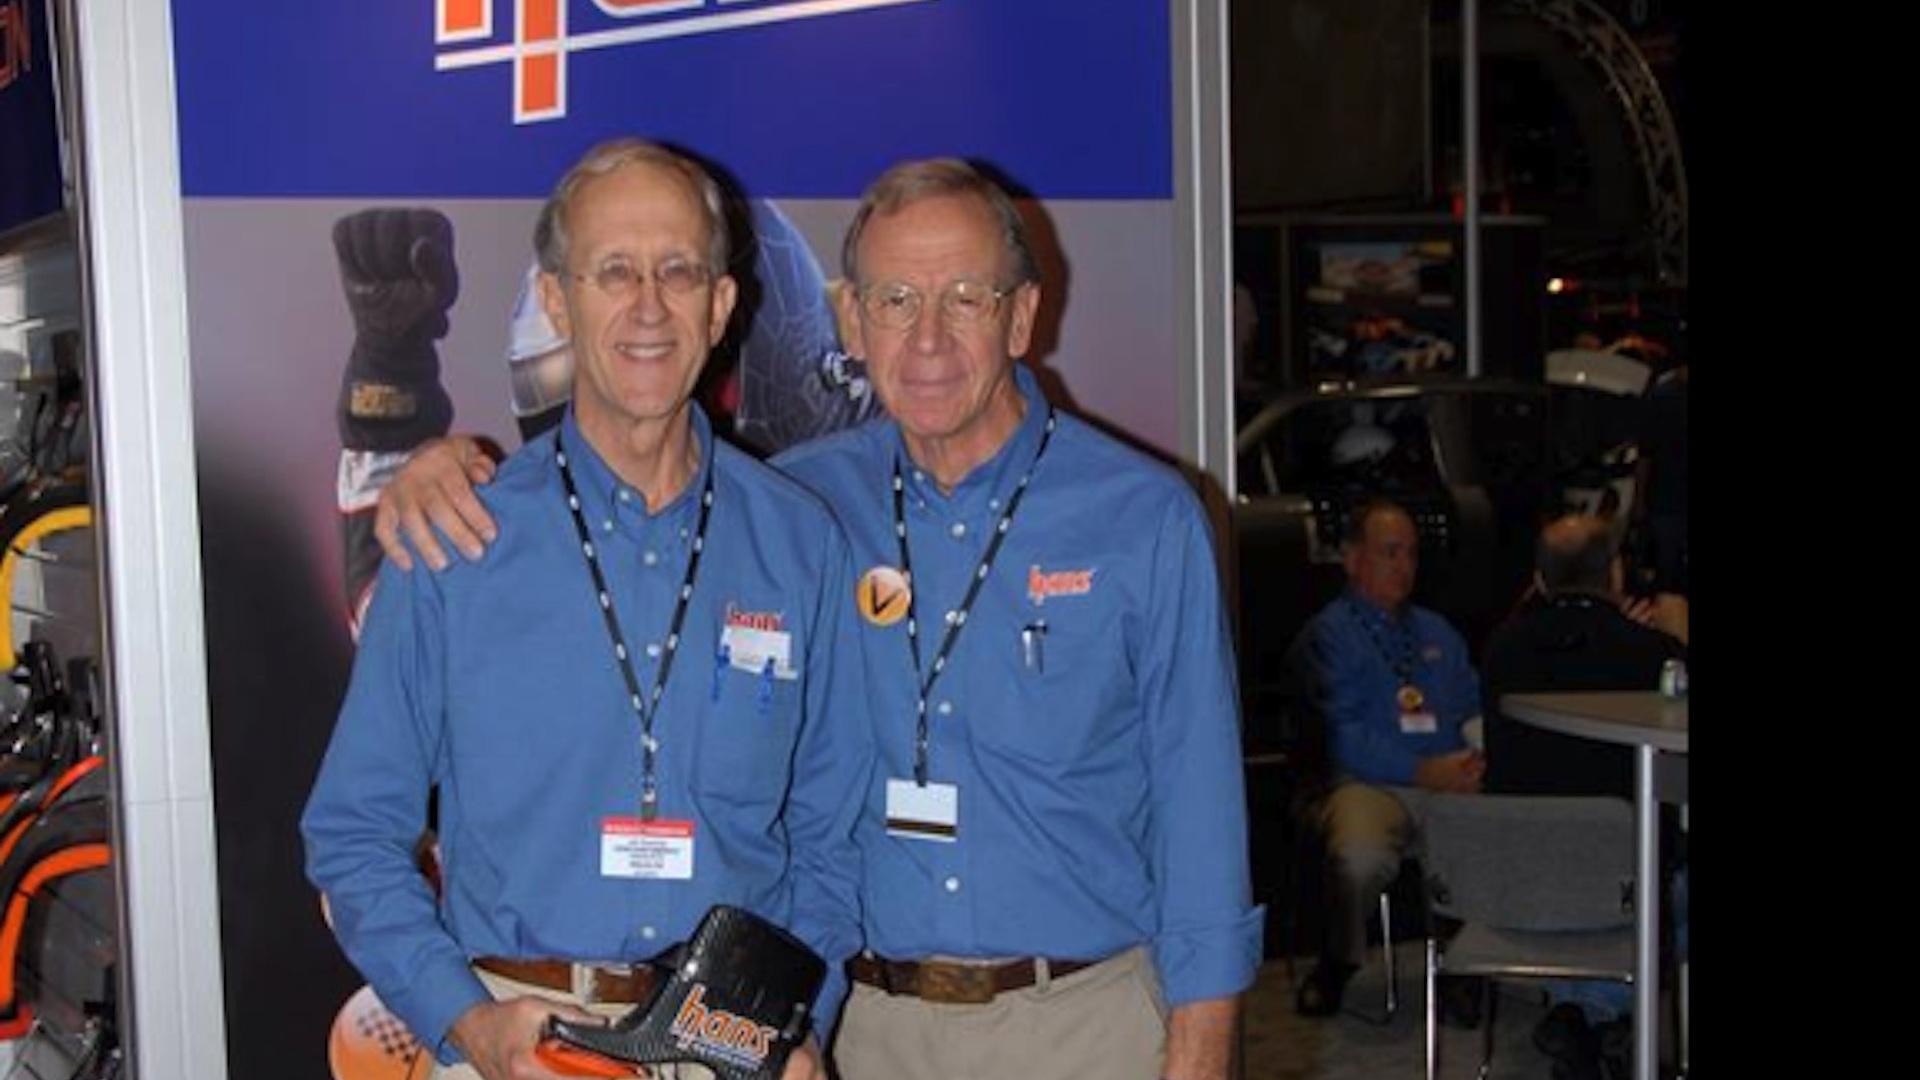 Dr. Robert Hubbard (right), HANS co-creator dead at 75